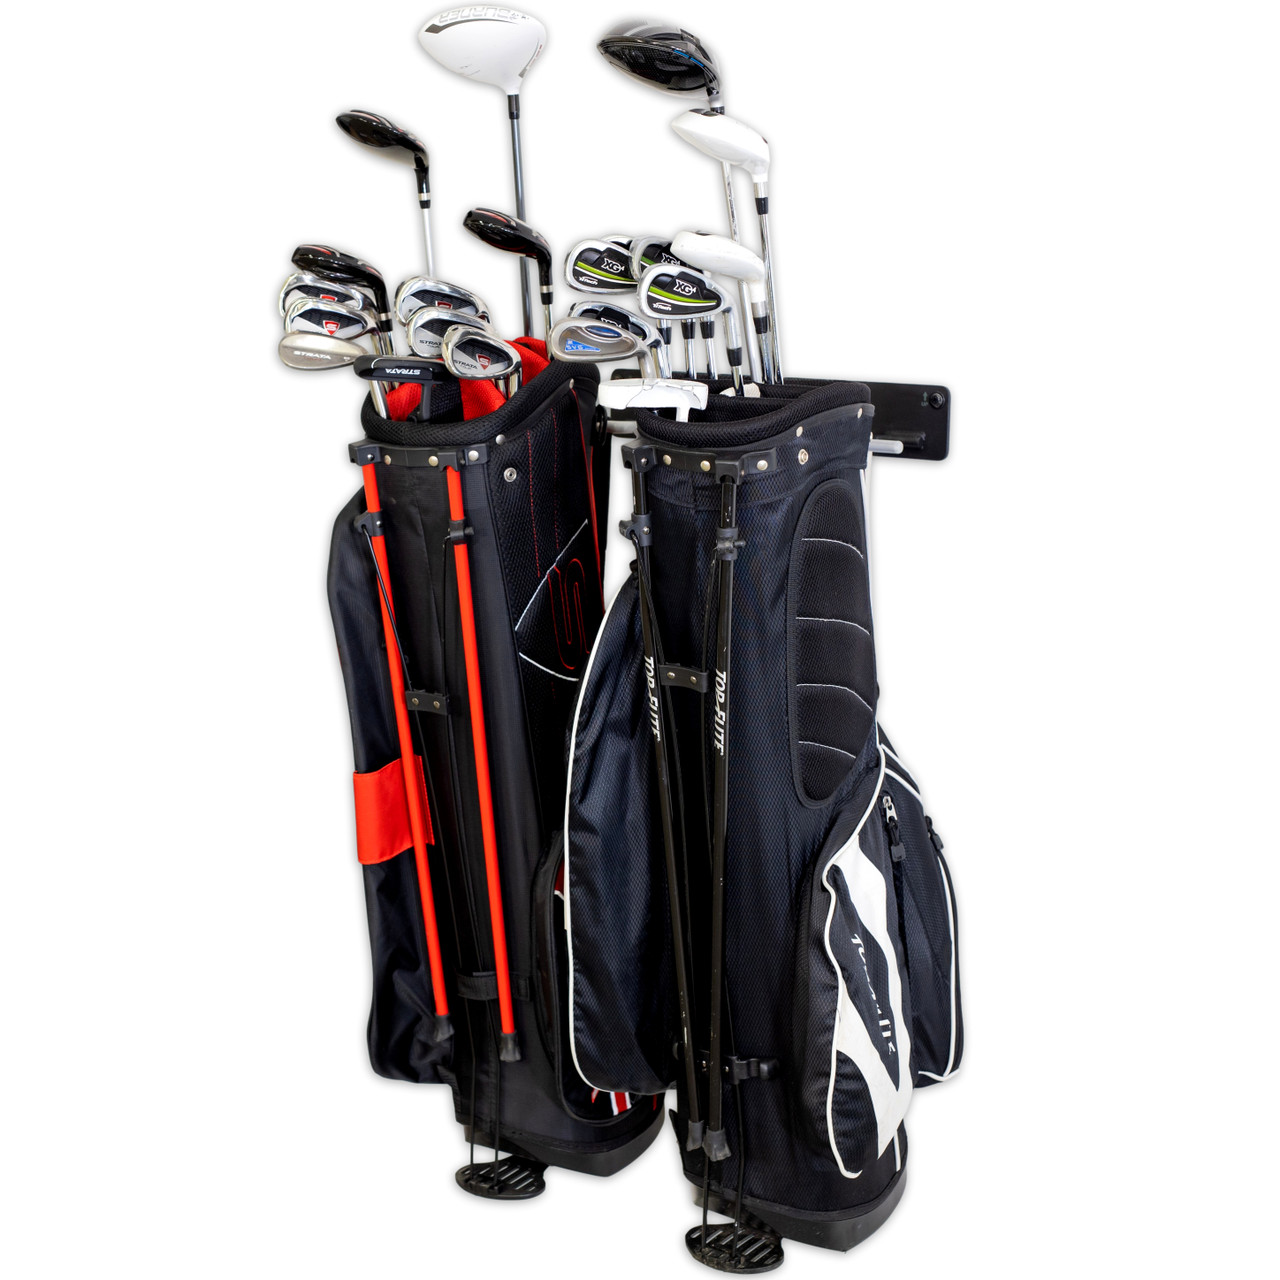 blat golf 2 bag wall rack garage home organizer heavy duty equipment storage